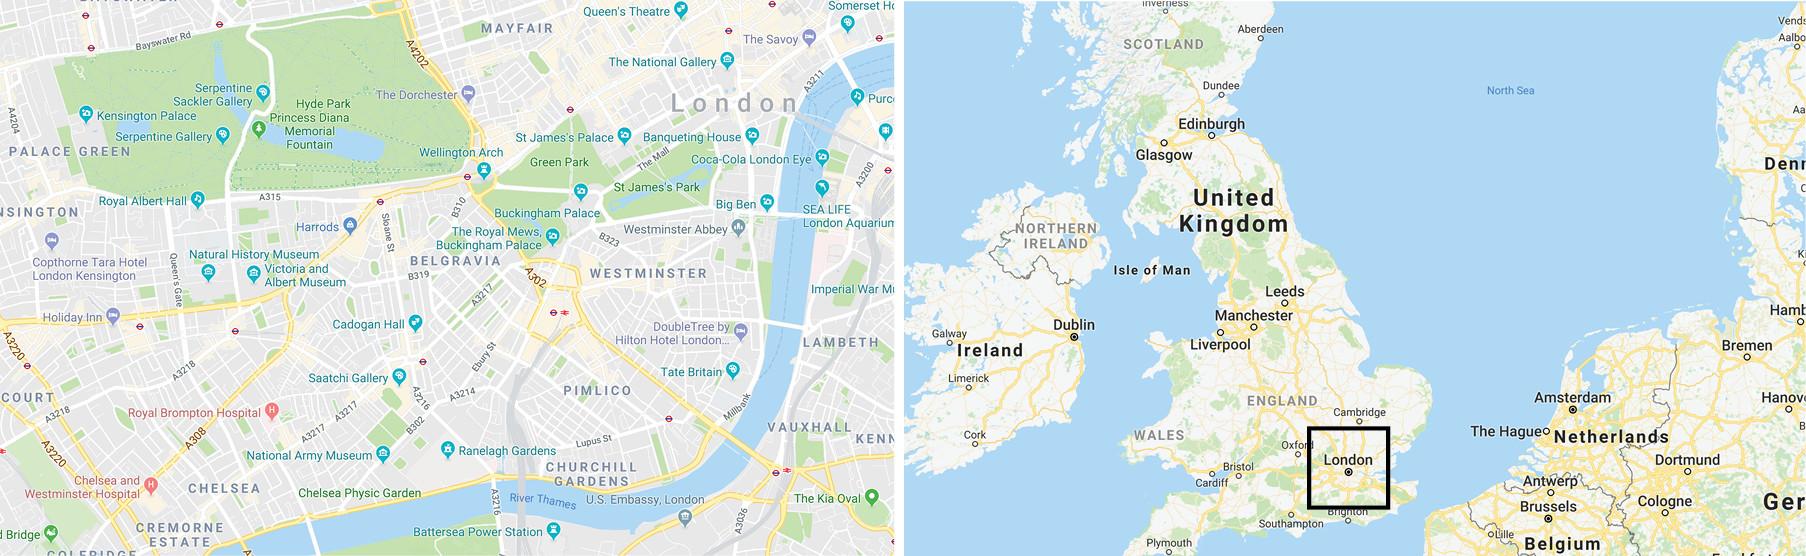 Map-London-England